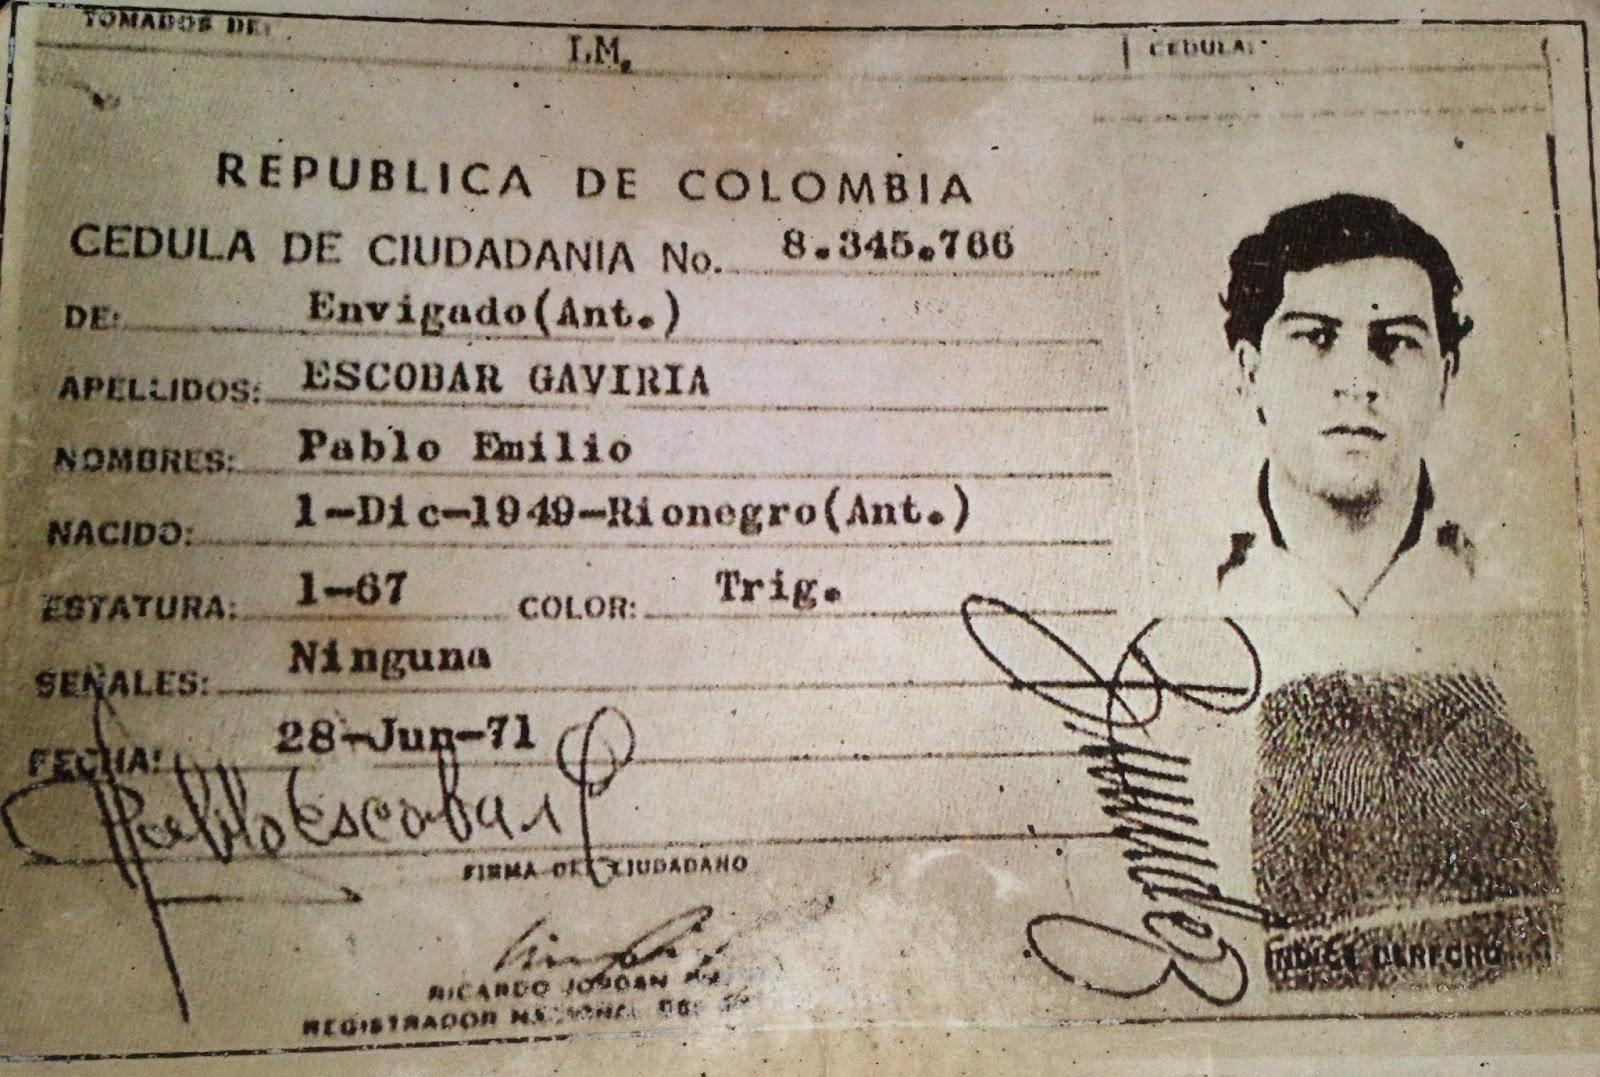 https://www.inmarathi.com/wp-content/uploads/2017/10/Pablo-Escobar-marathipizza04.jpg